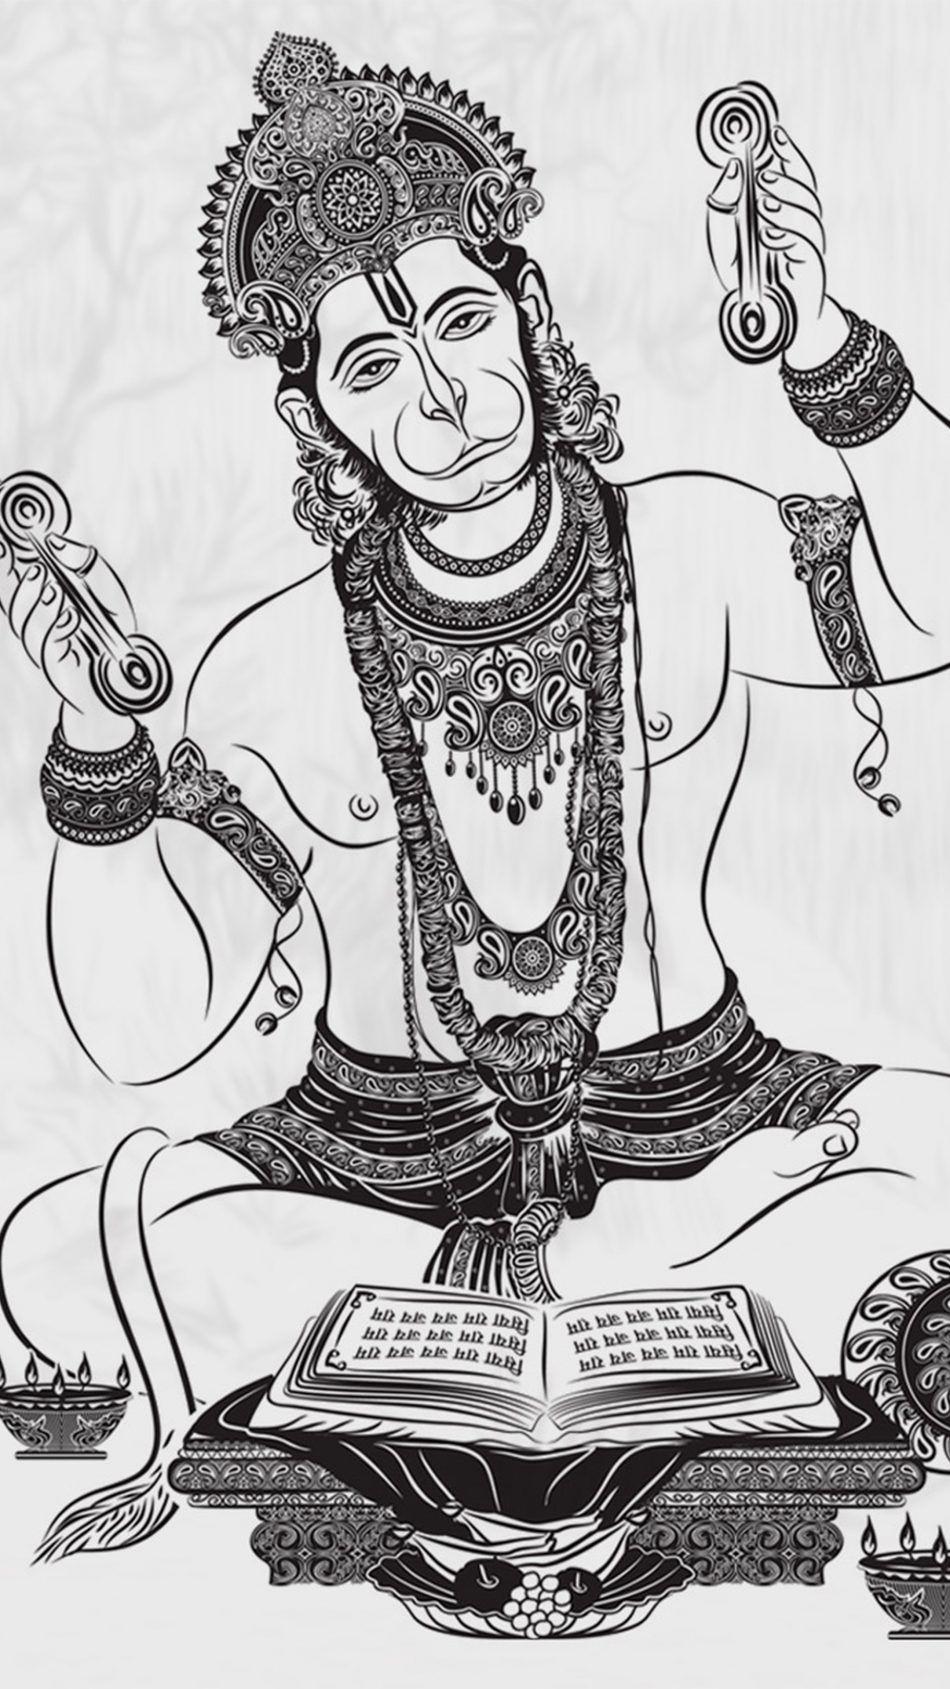 Lord Hanuman Art 4k Ultra Hd Mobile Wallpaper Mandala Design Art Mandala Art Lesson Hanuman